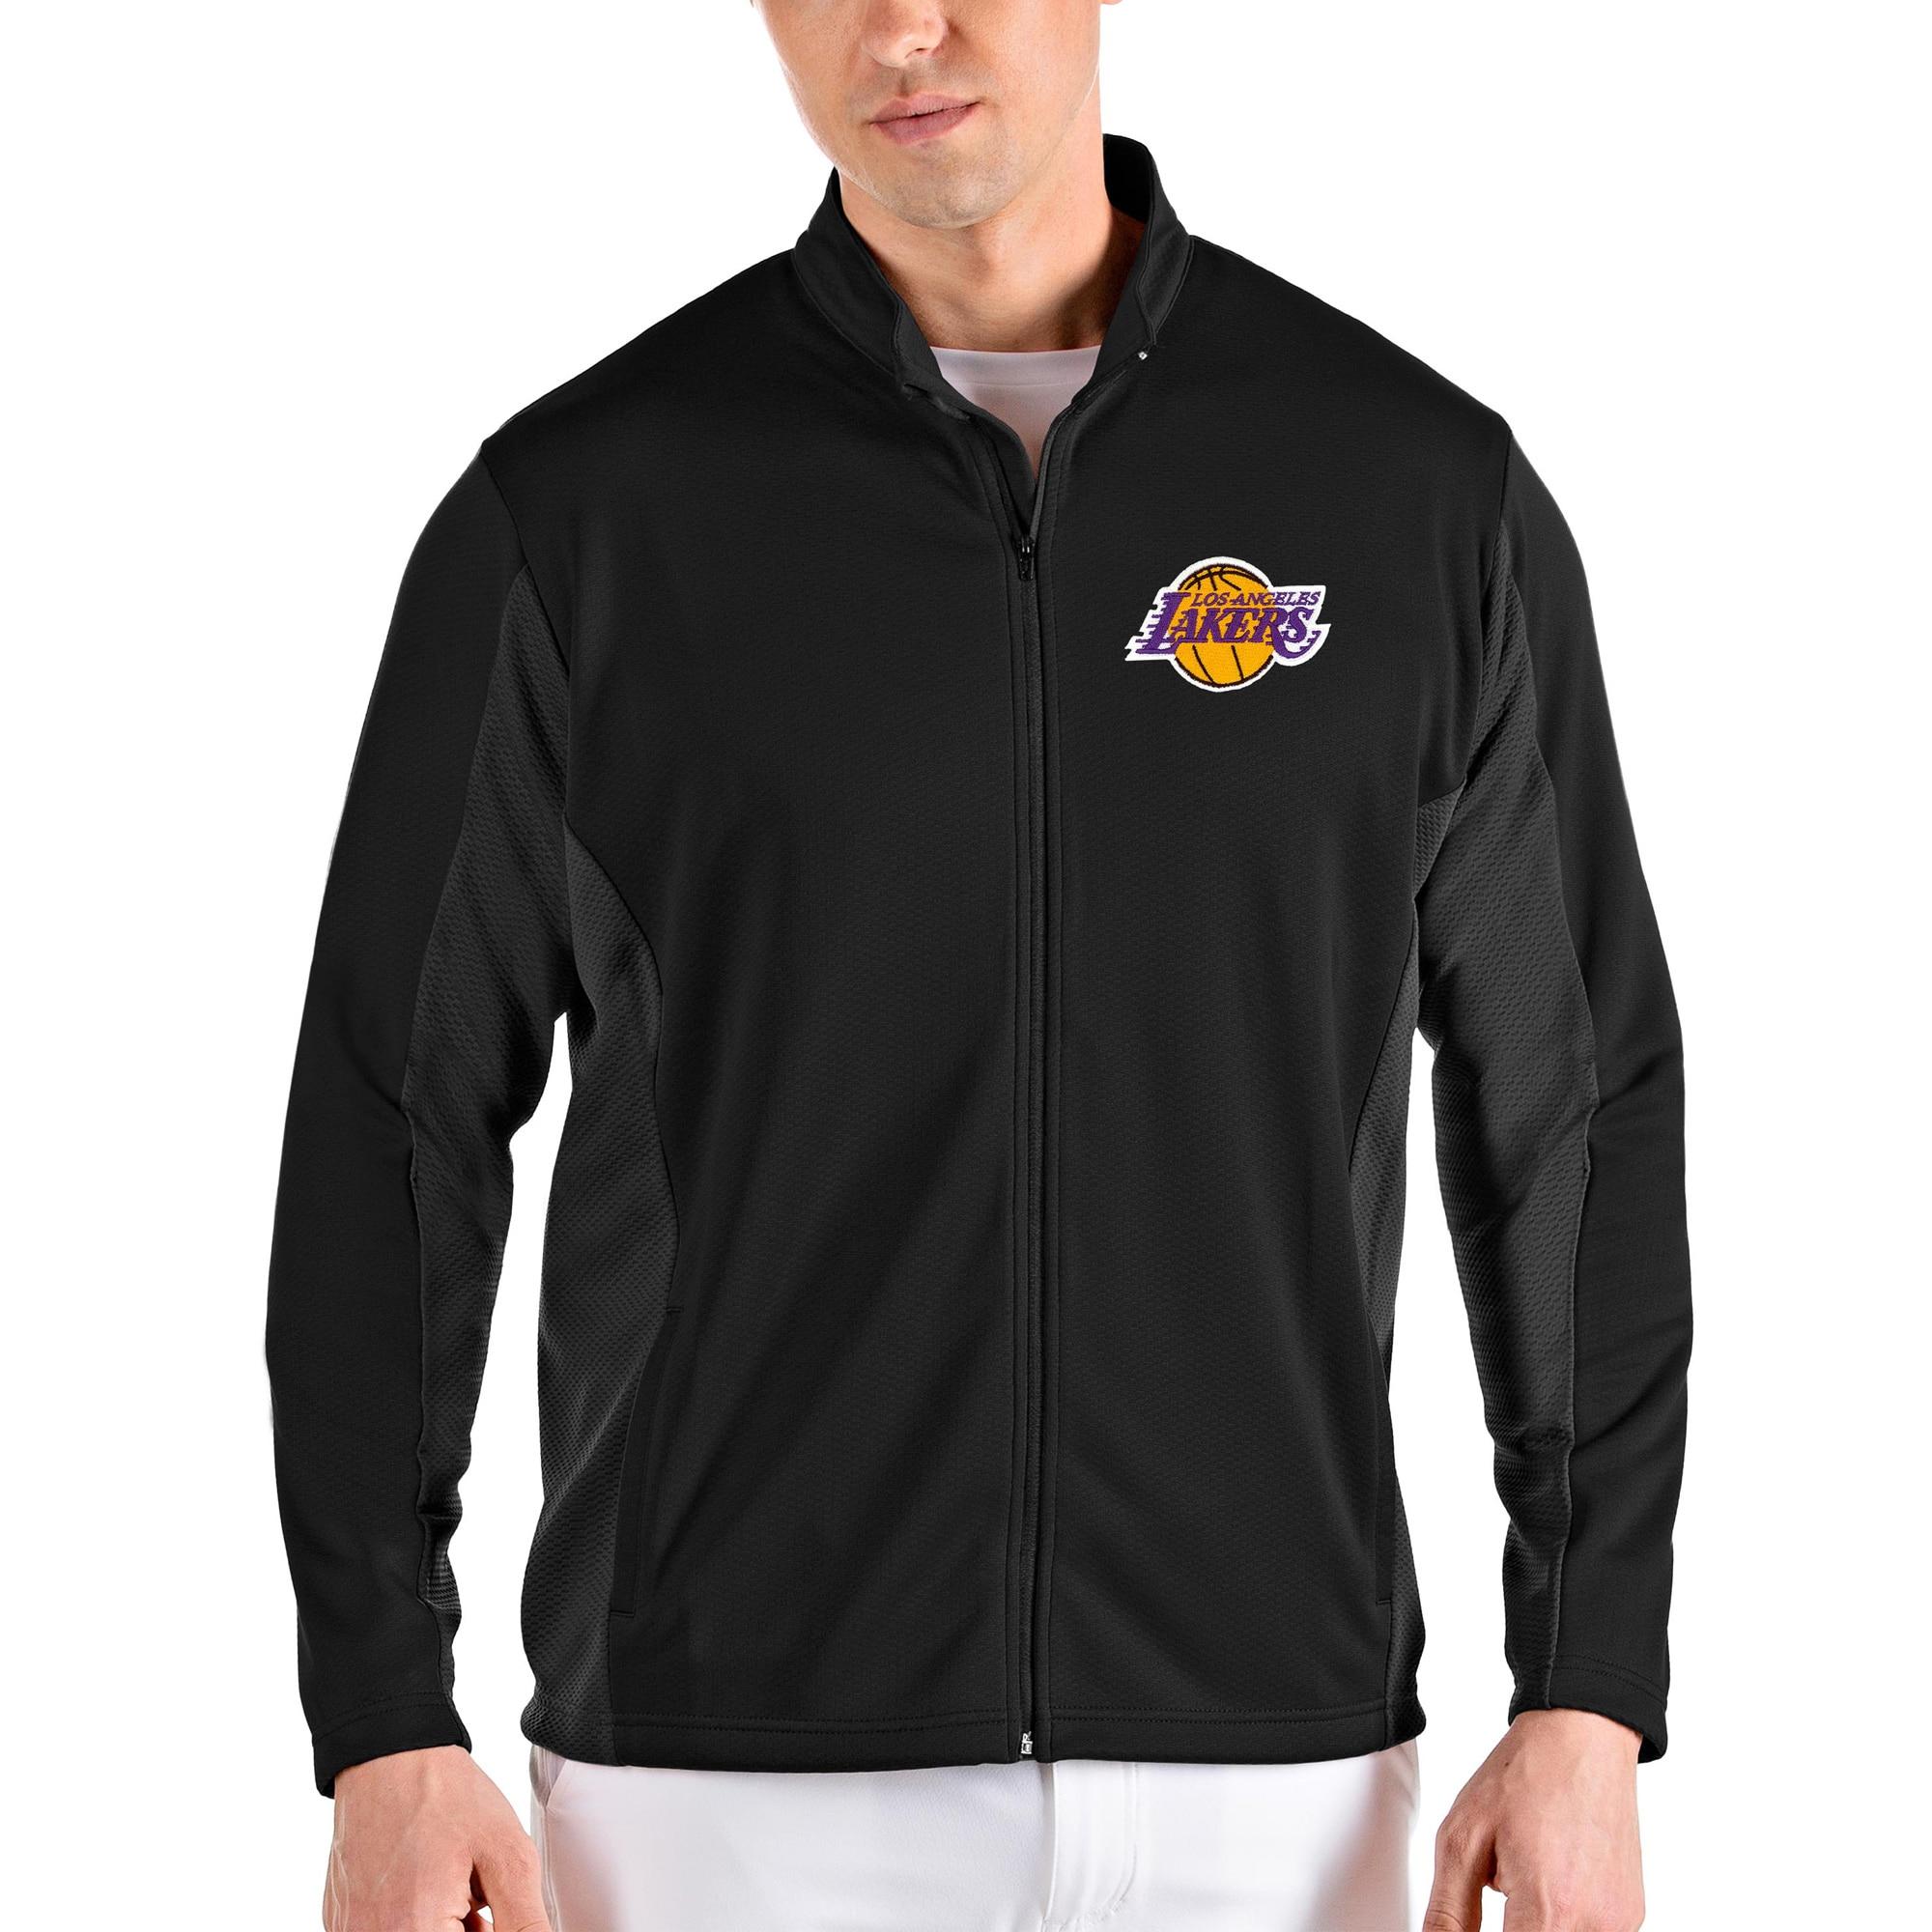 Los Angeles Lakers Antigua Passage Full-Zip Jacket - Black/Gray